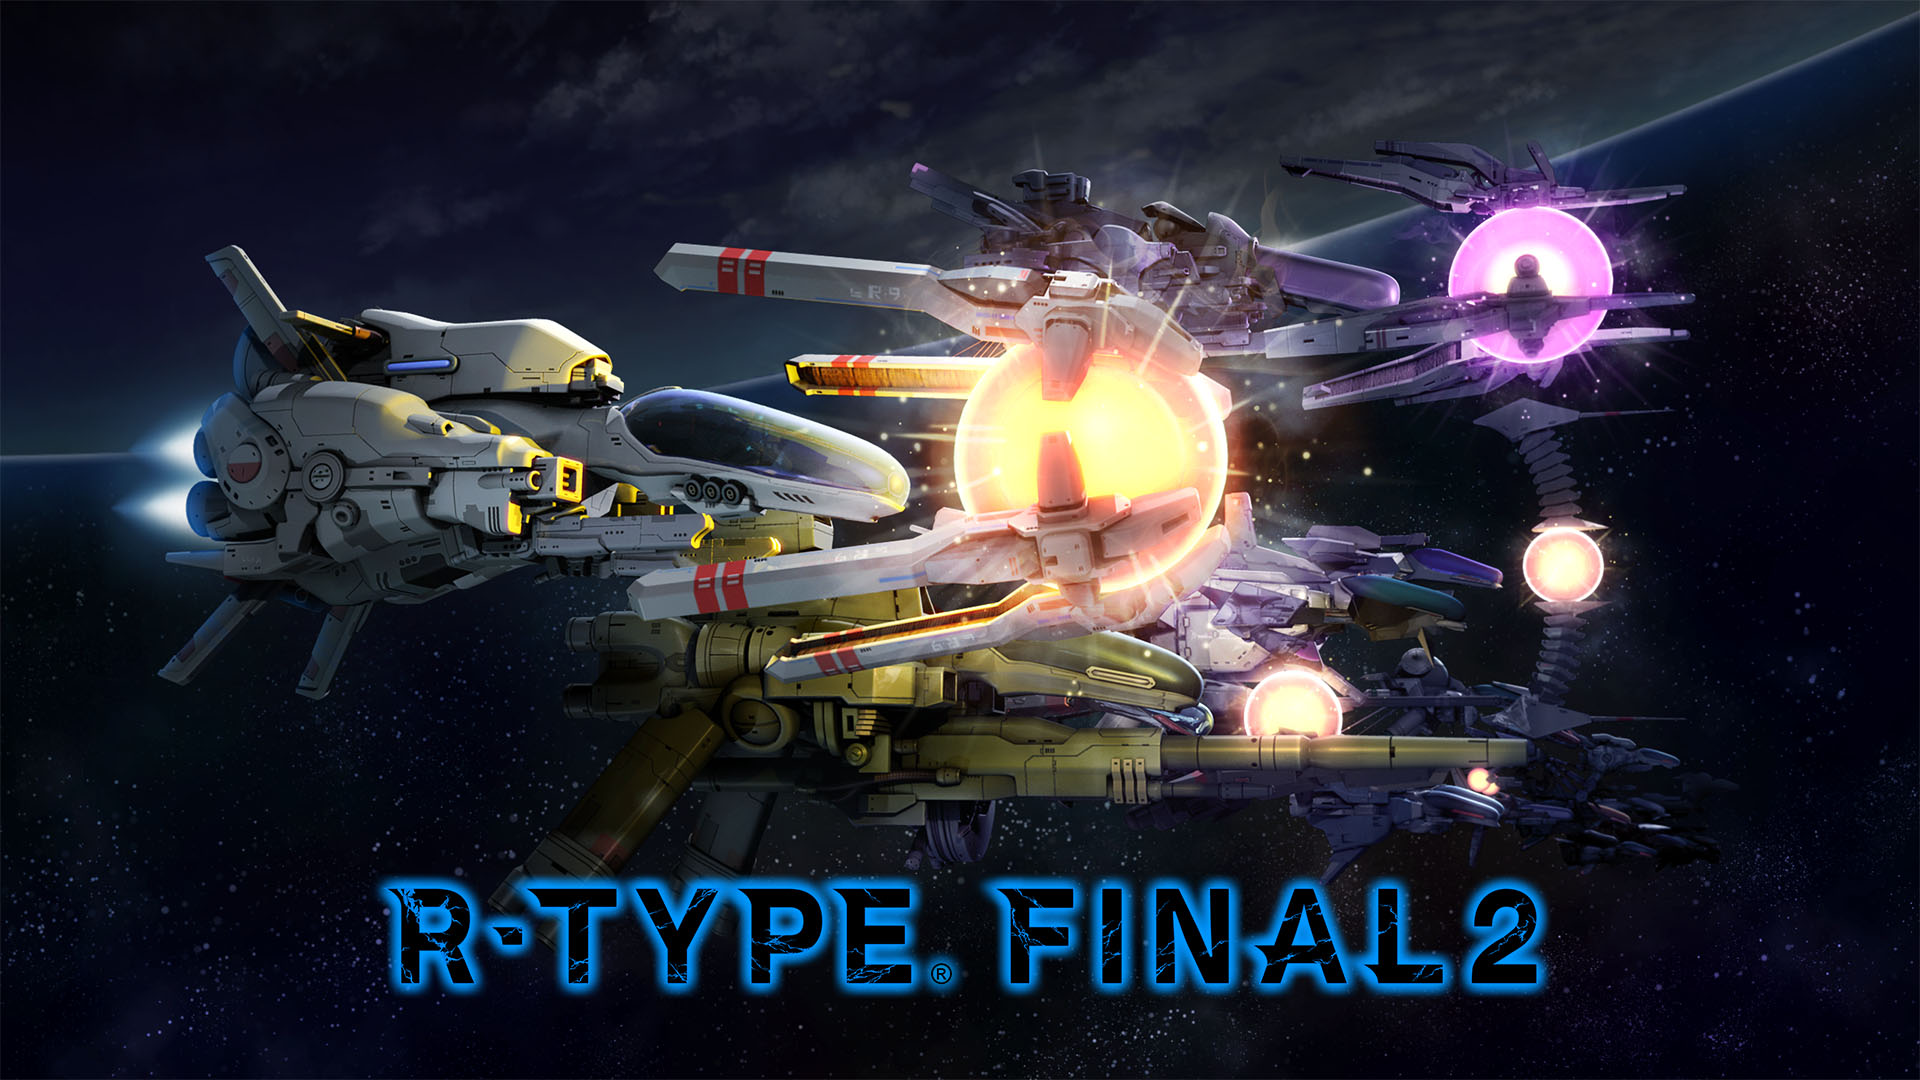 R-Type Final 2 TGS 2019 gameplay video